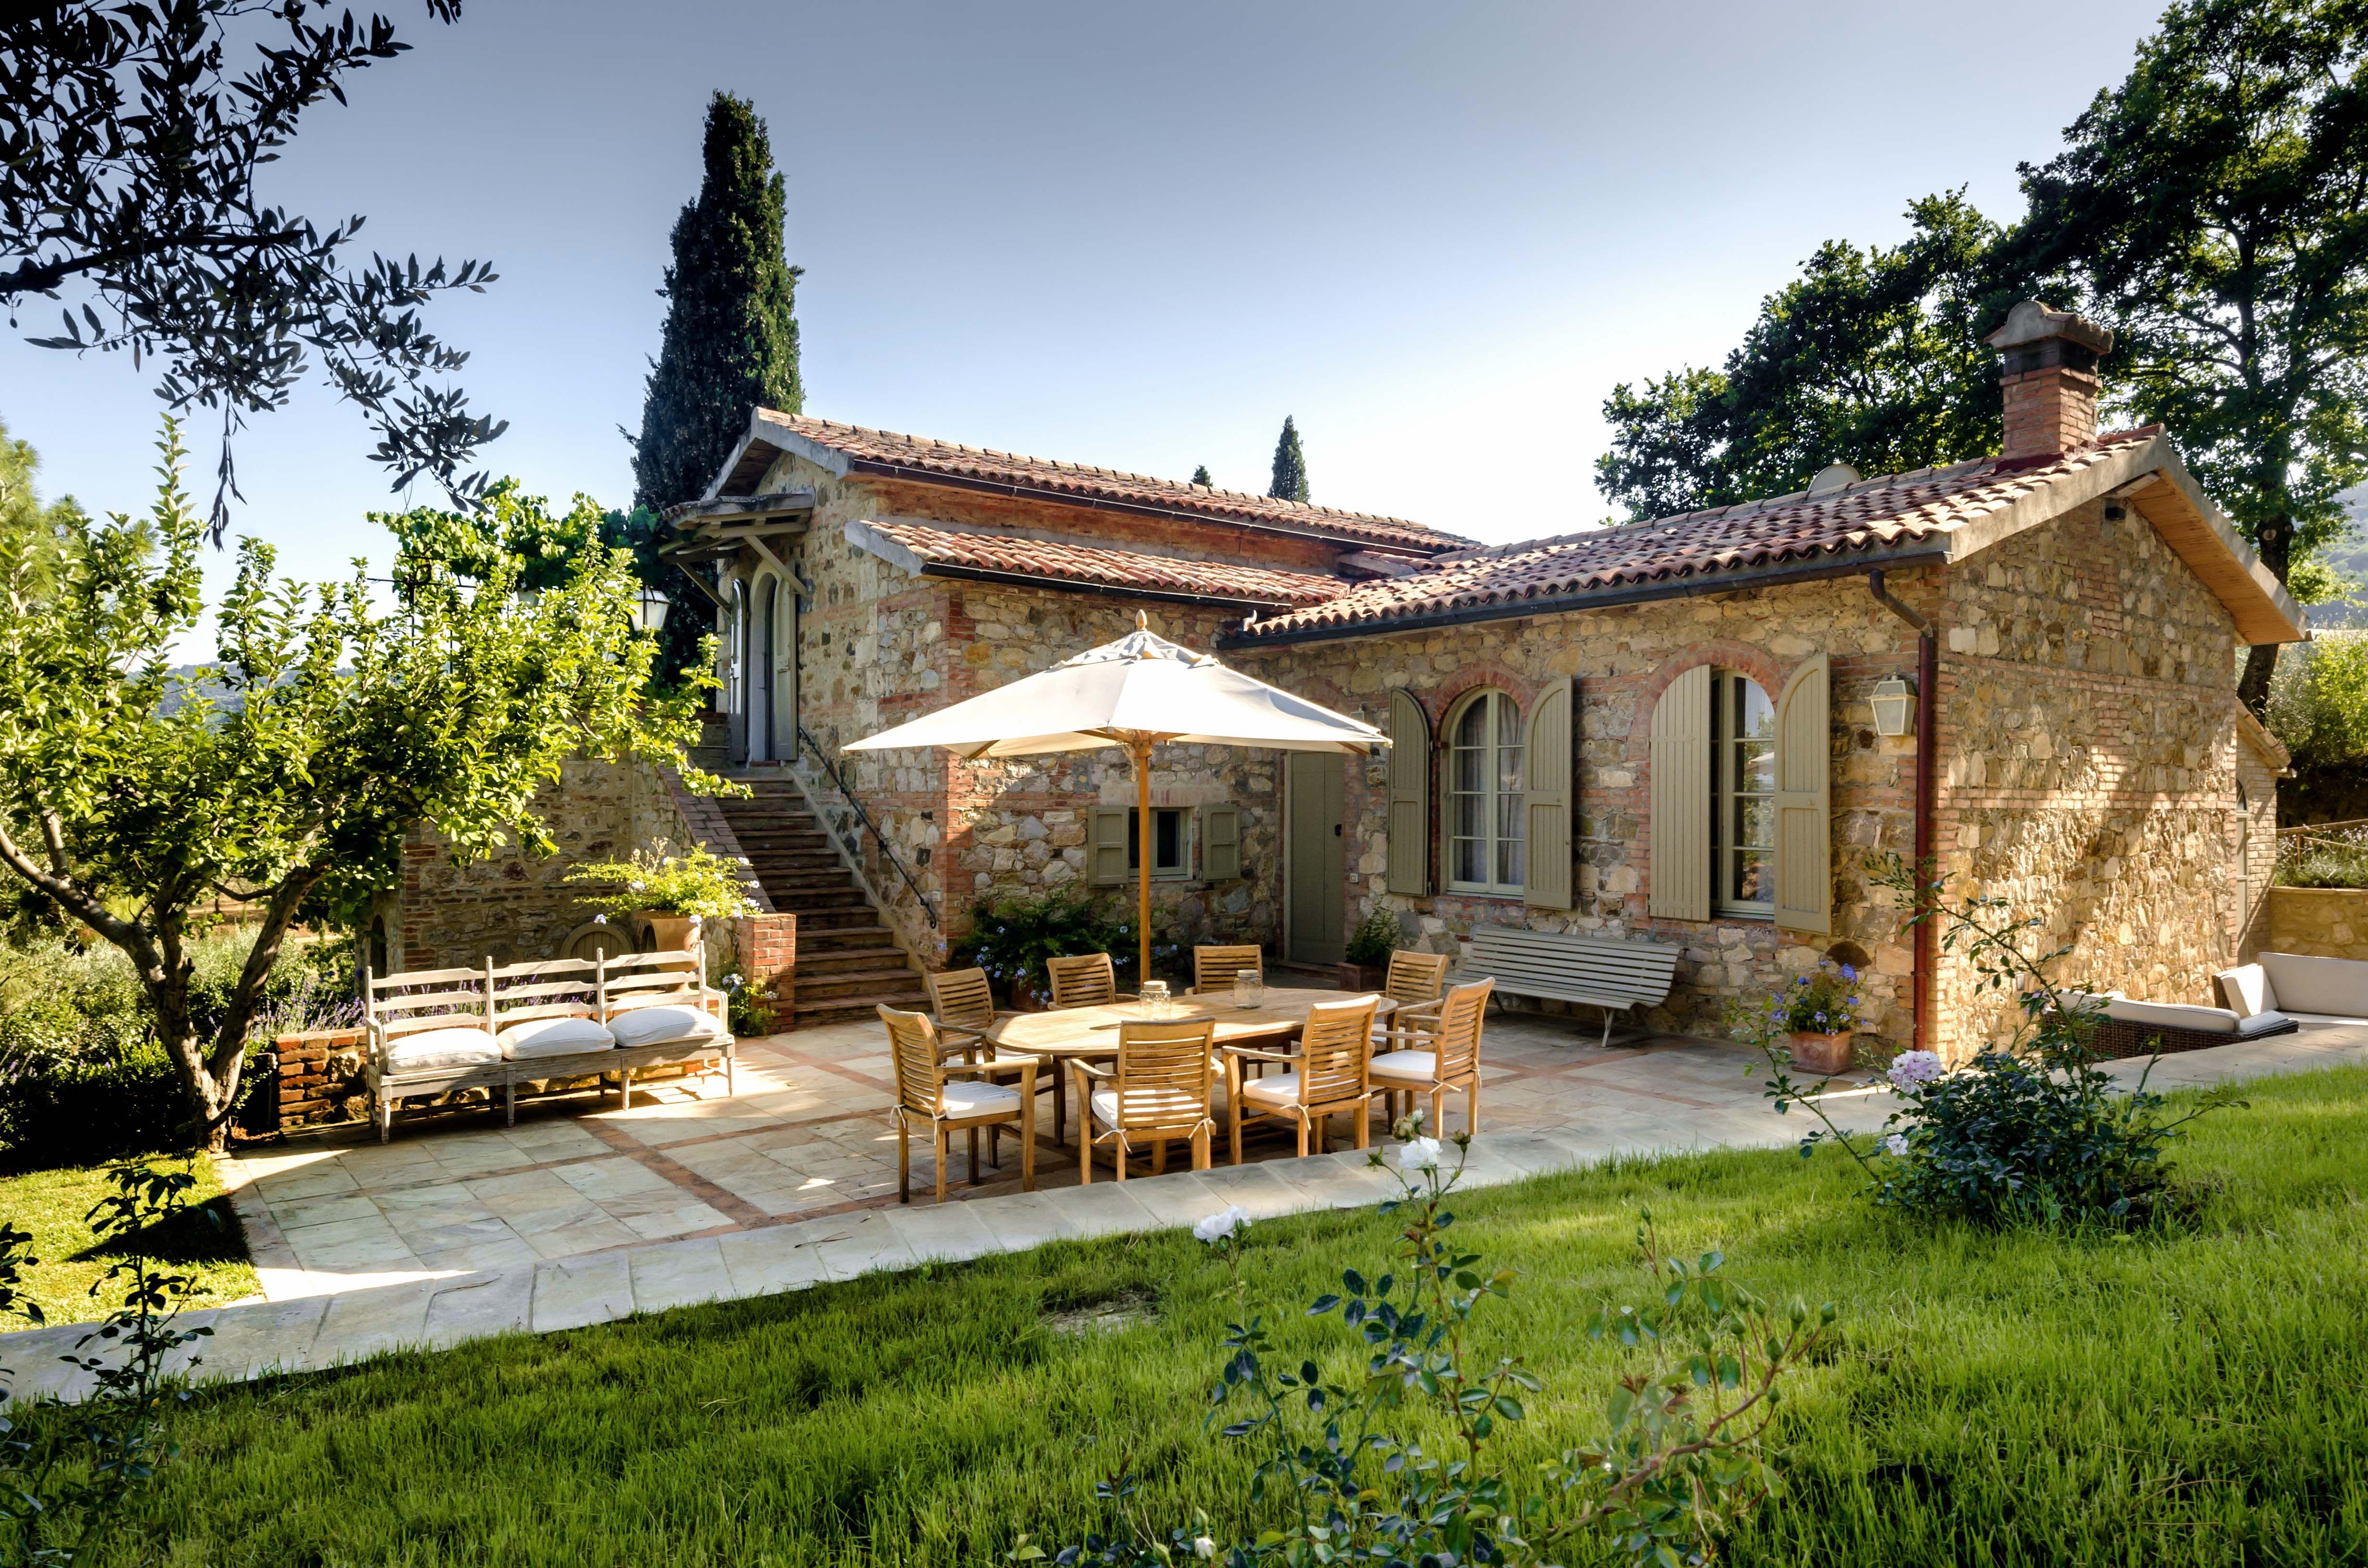 lunablu, cetona, #tuscany. #luxurious #villa #rental in #tuscany